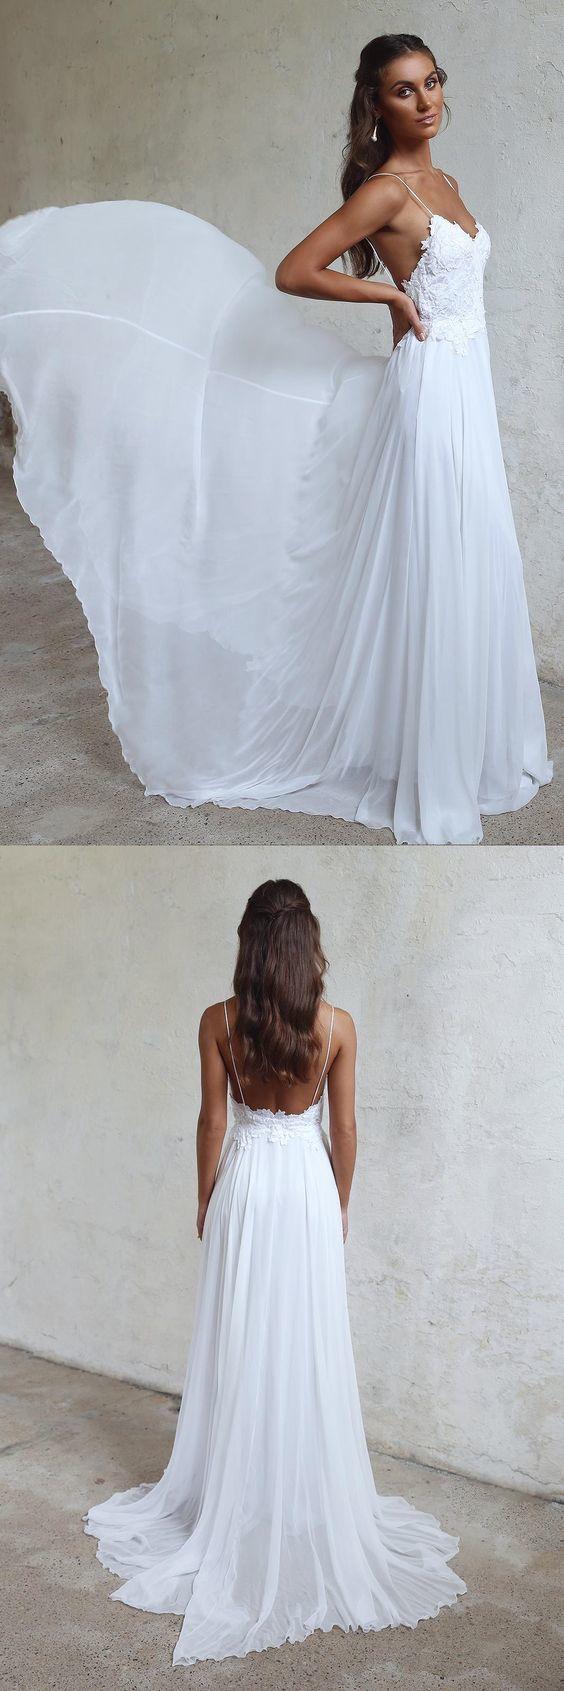 Boho Beach Wedding Dresses Sexy Open Backs Lace White Wedding Gown